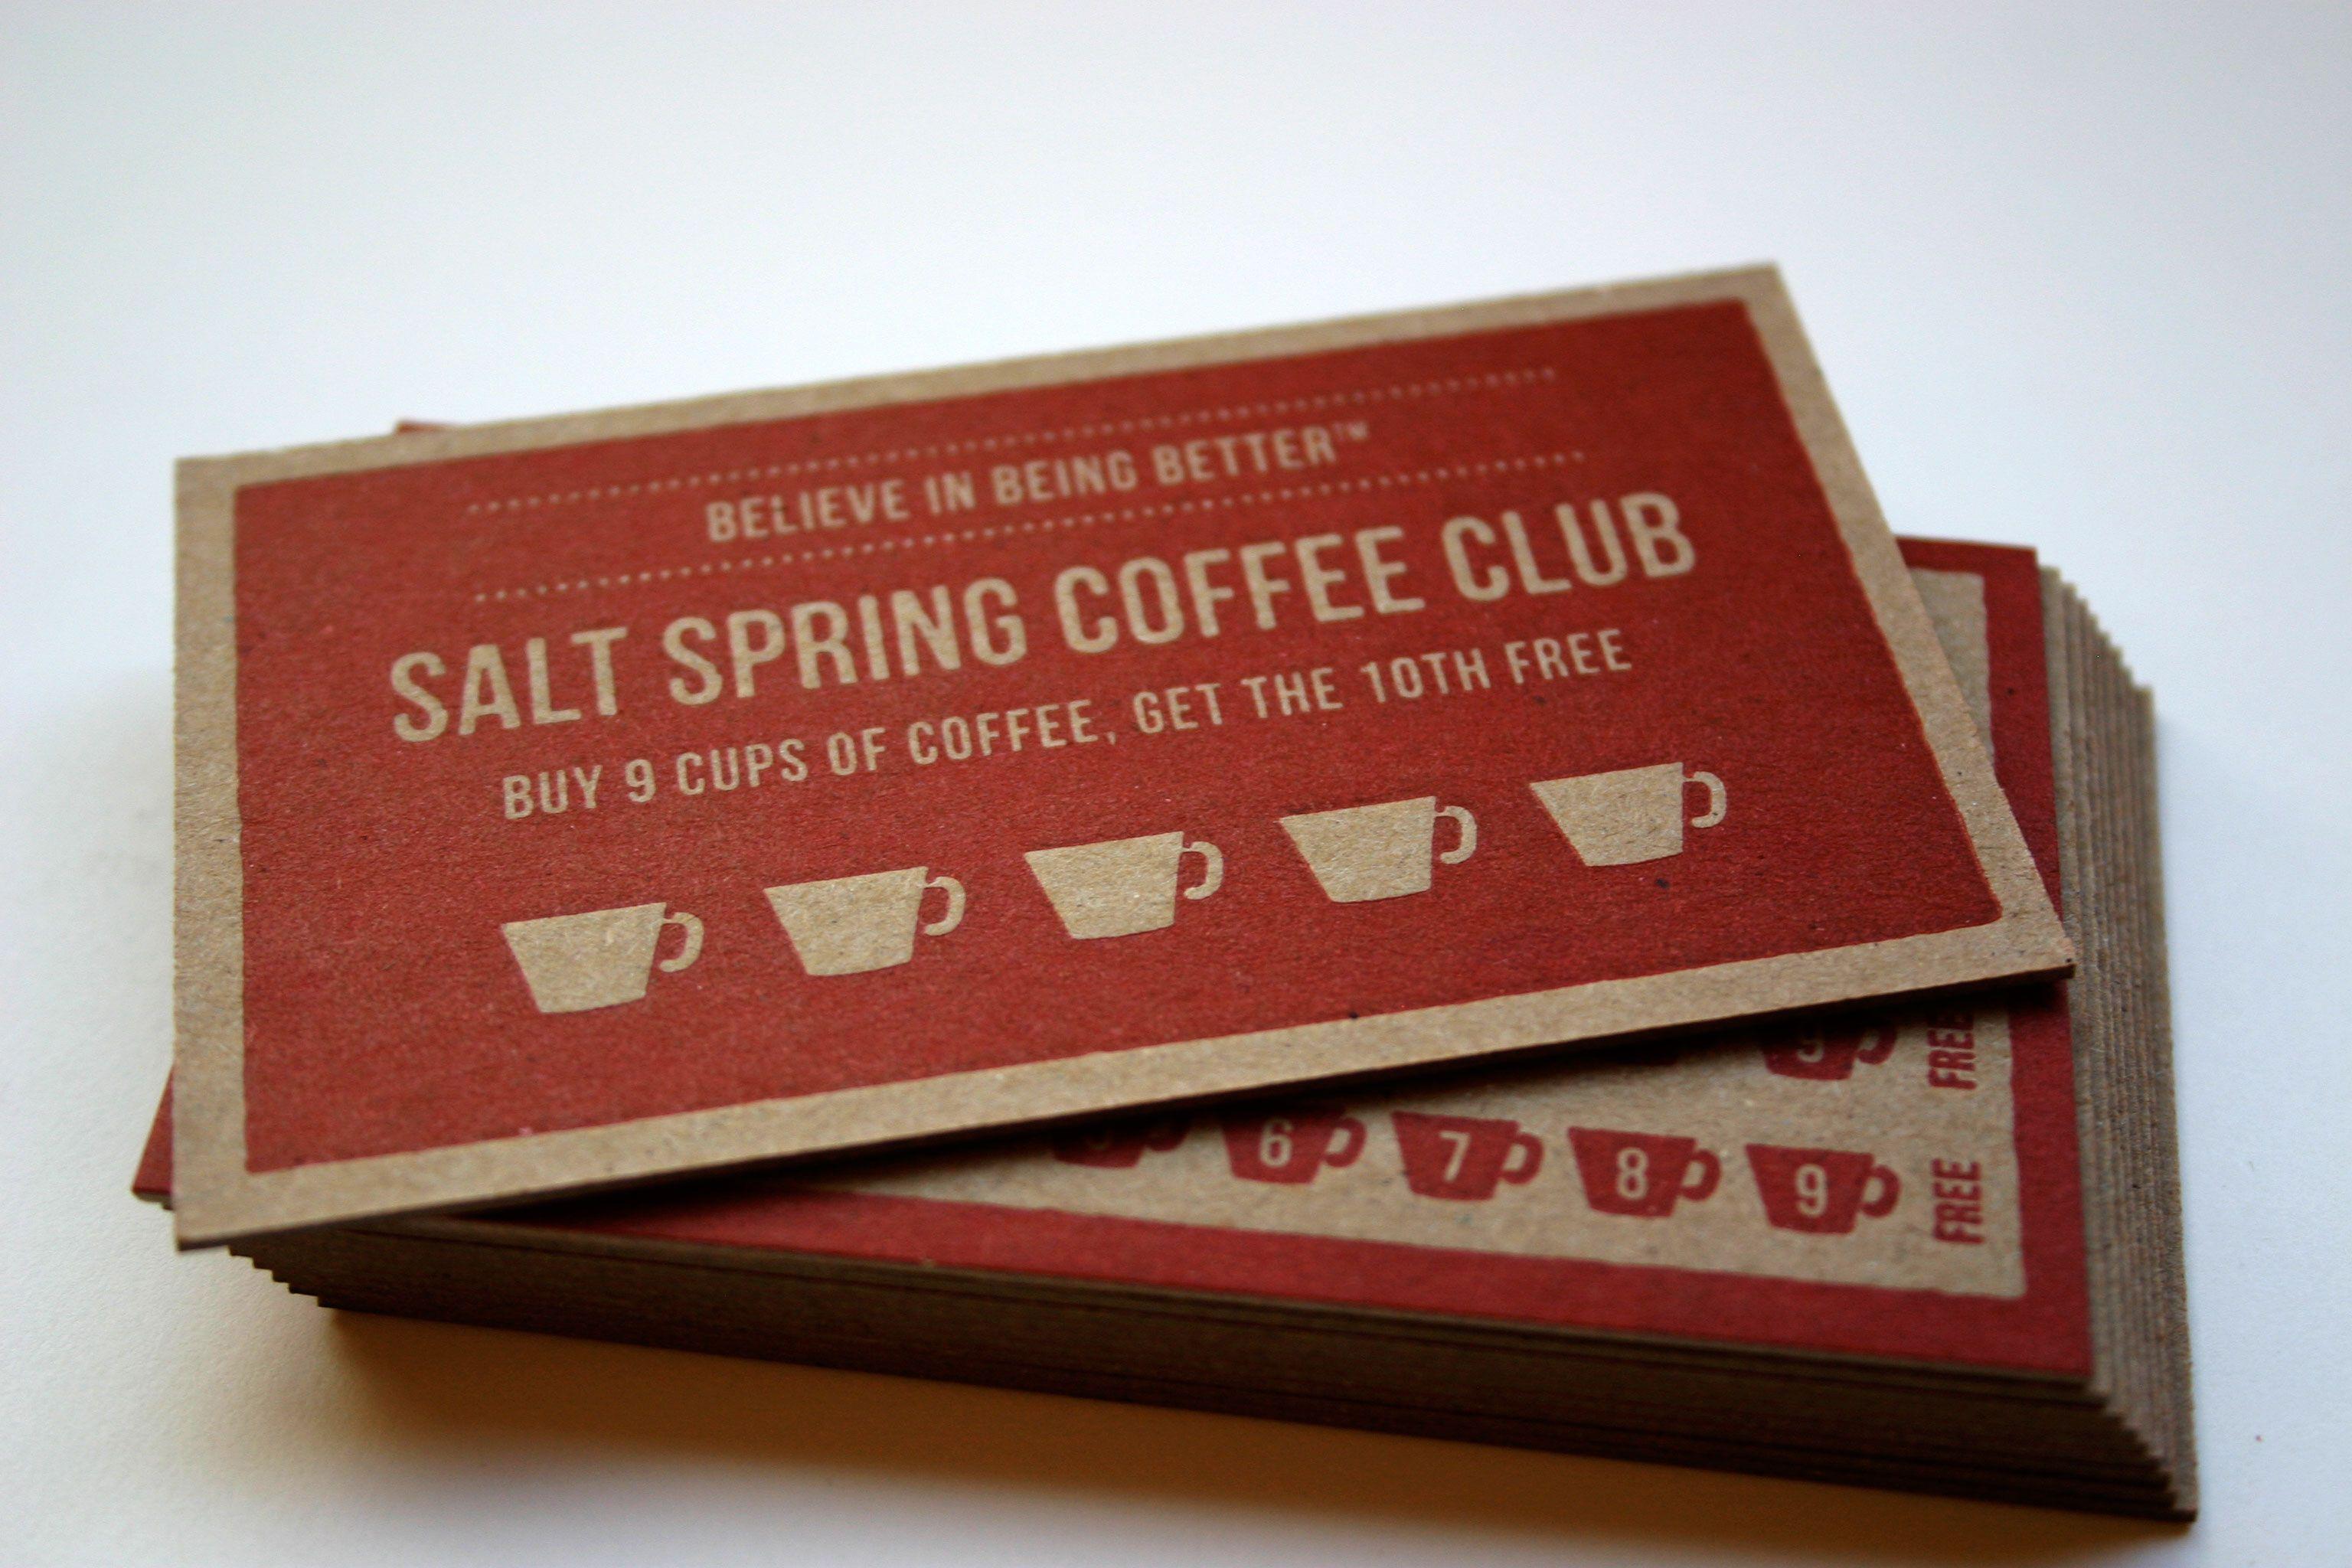 201209_Salstspring Loyalty Cards_2 | Restaurant | Pinterest ...